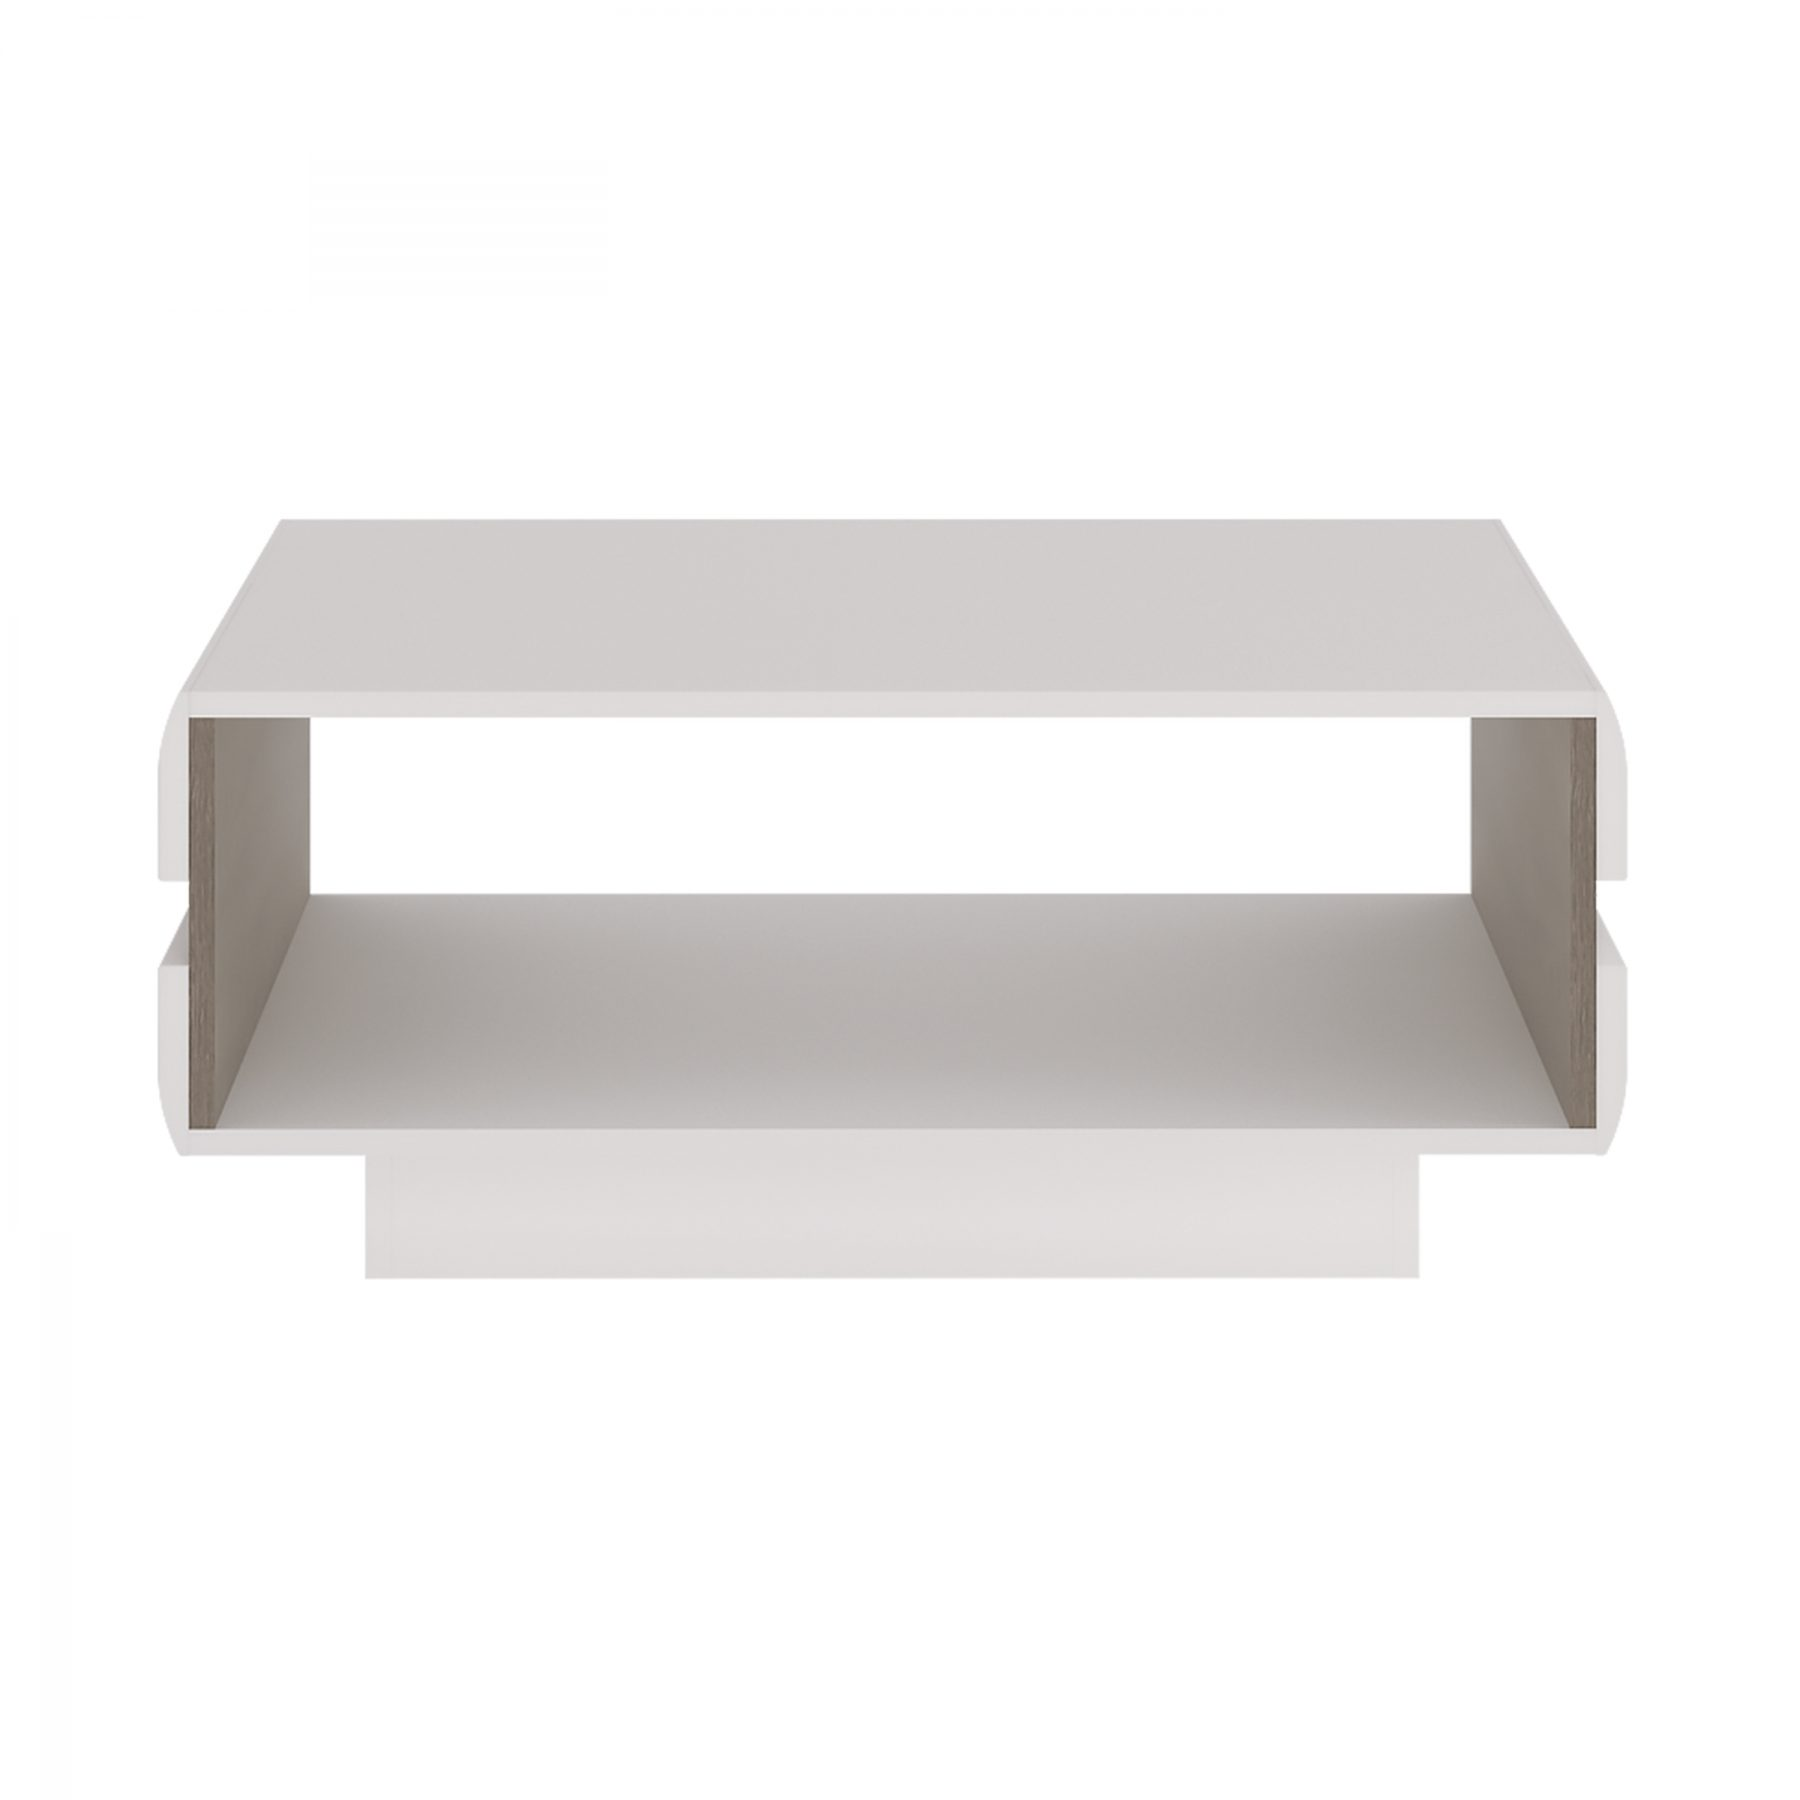 Mode White Gloss Coffee Table 1